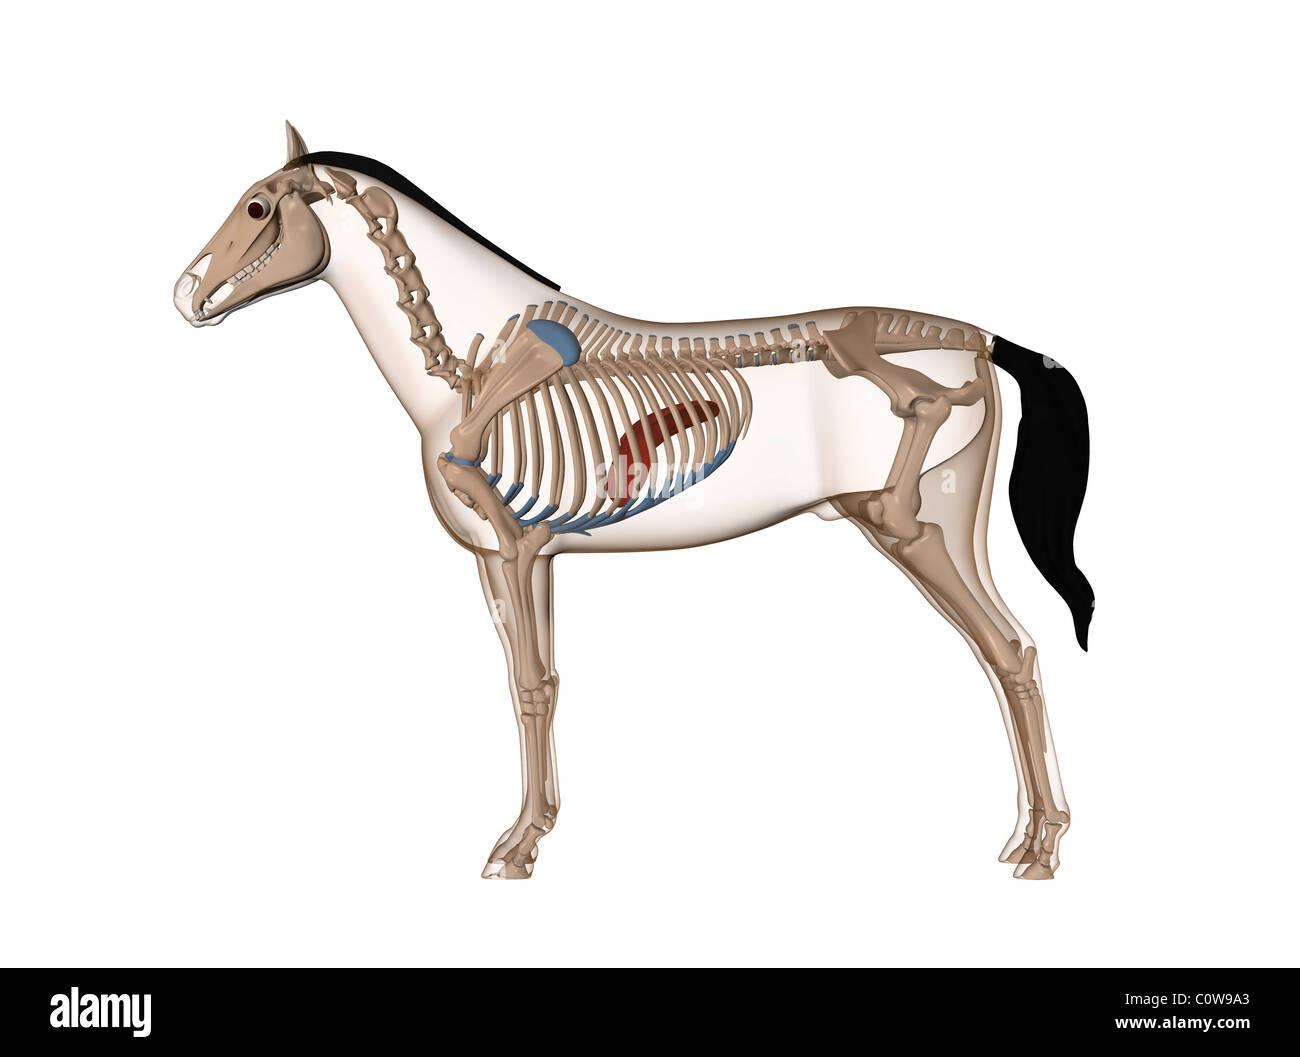 Pferd Anatomie Leber Stockfoto, Bild: 34976875 - Alamy